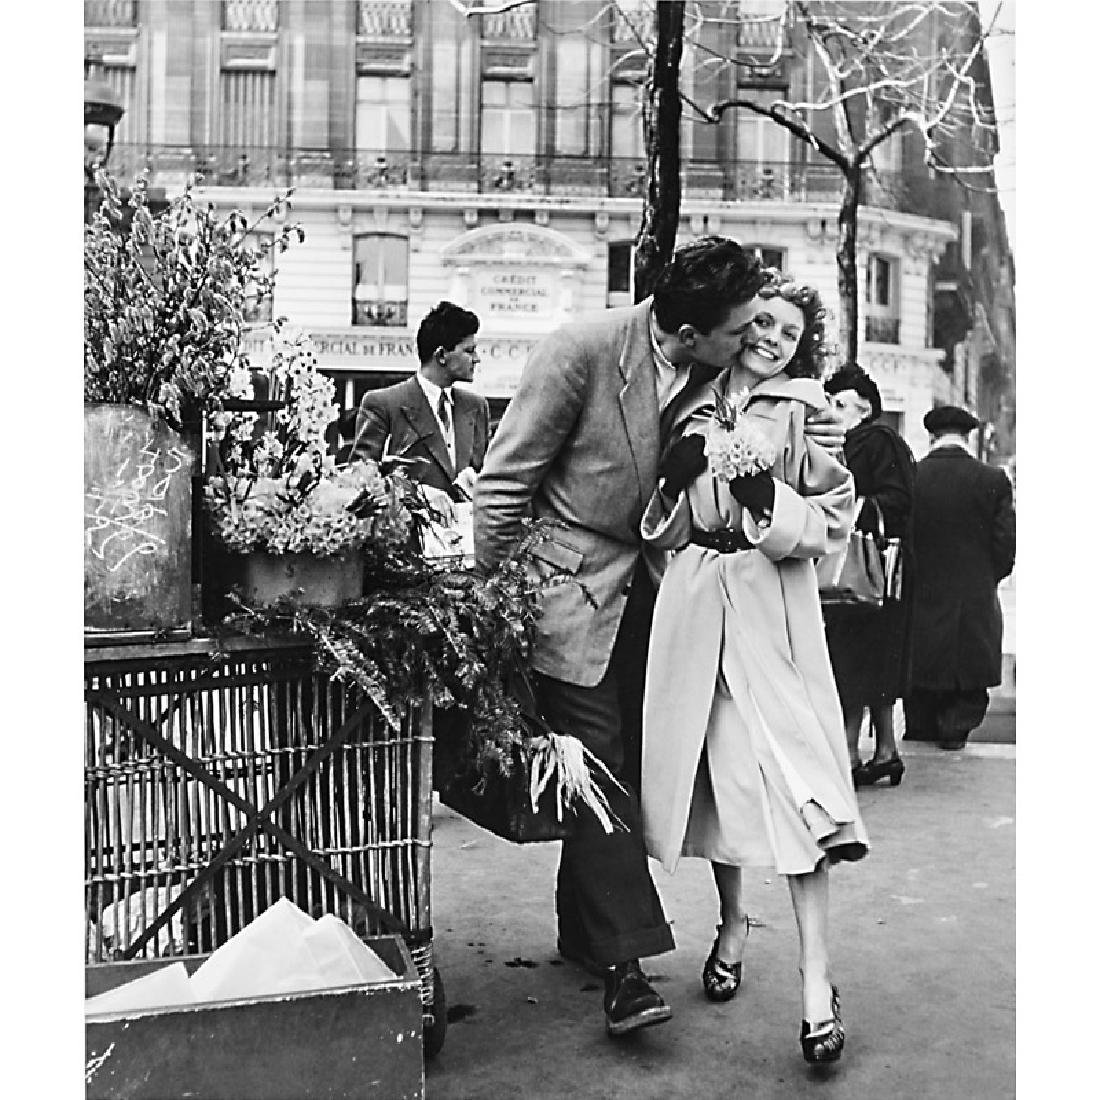 Robert Doisneau (French, 1912-1994)